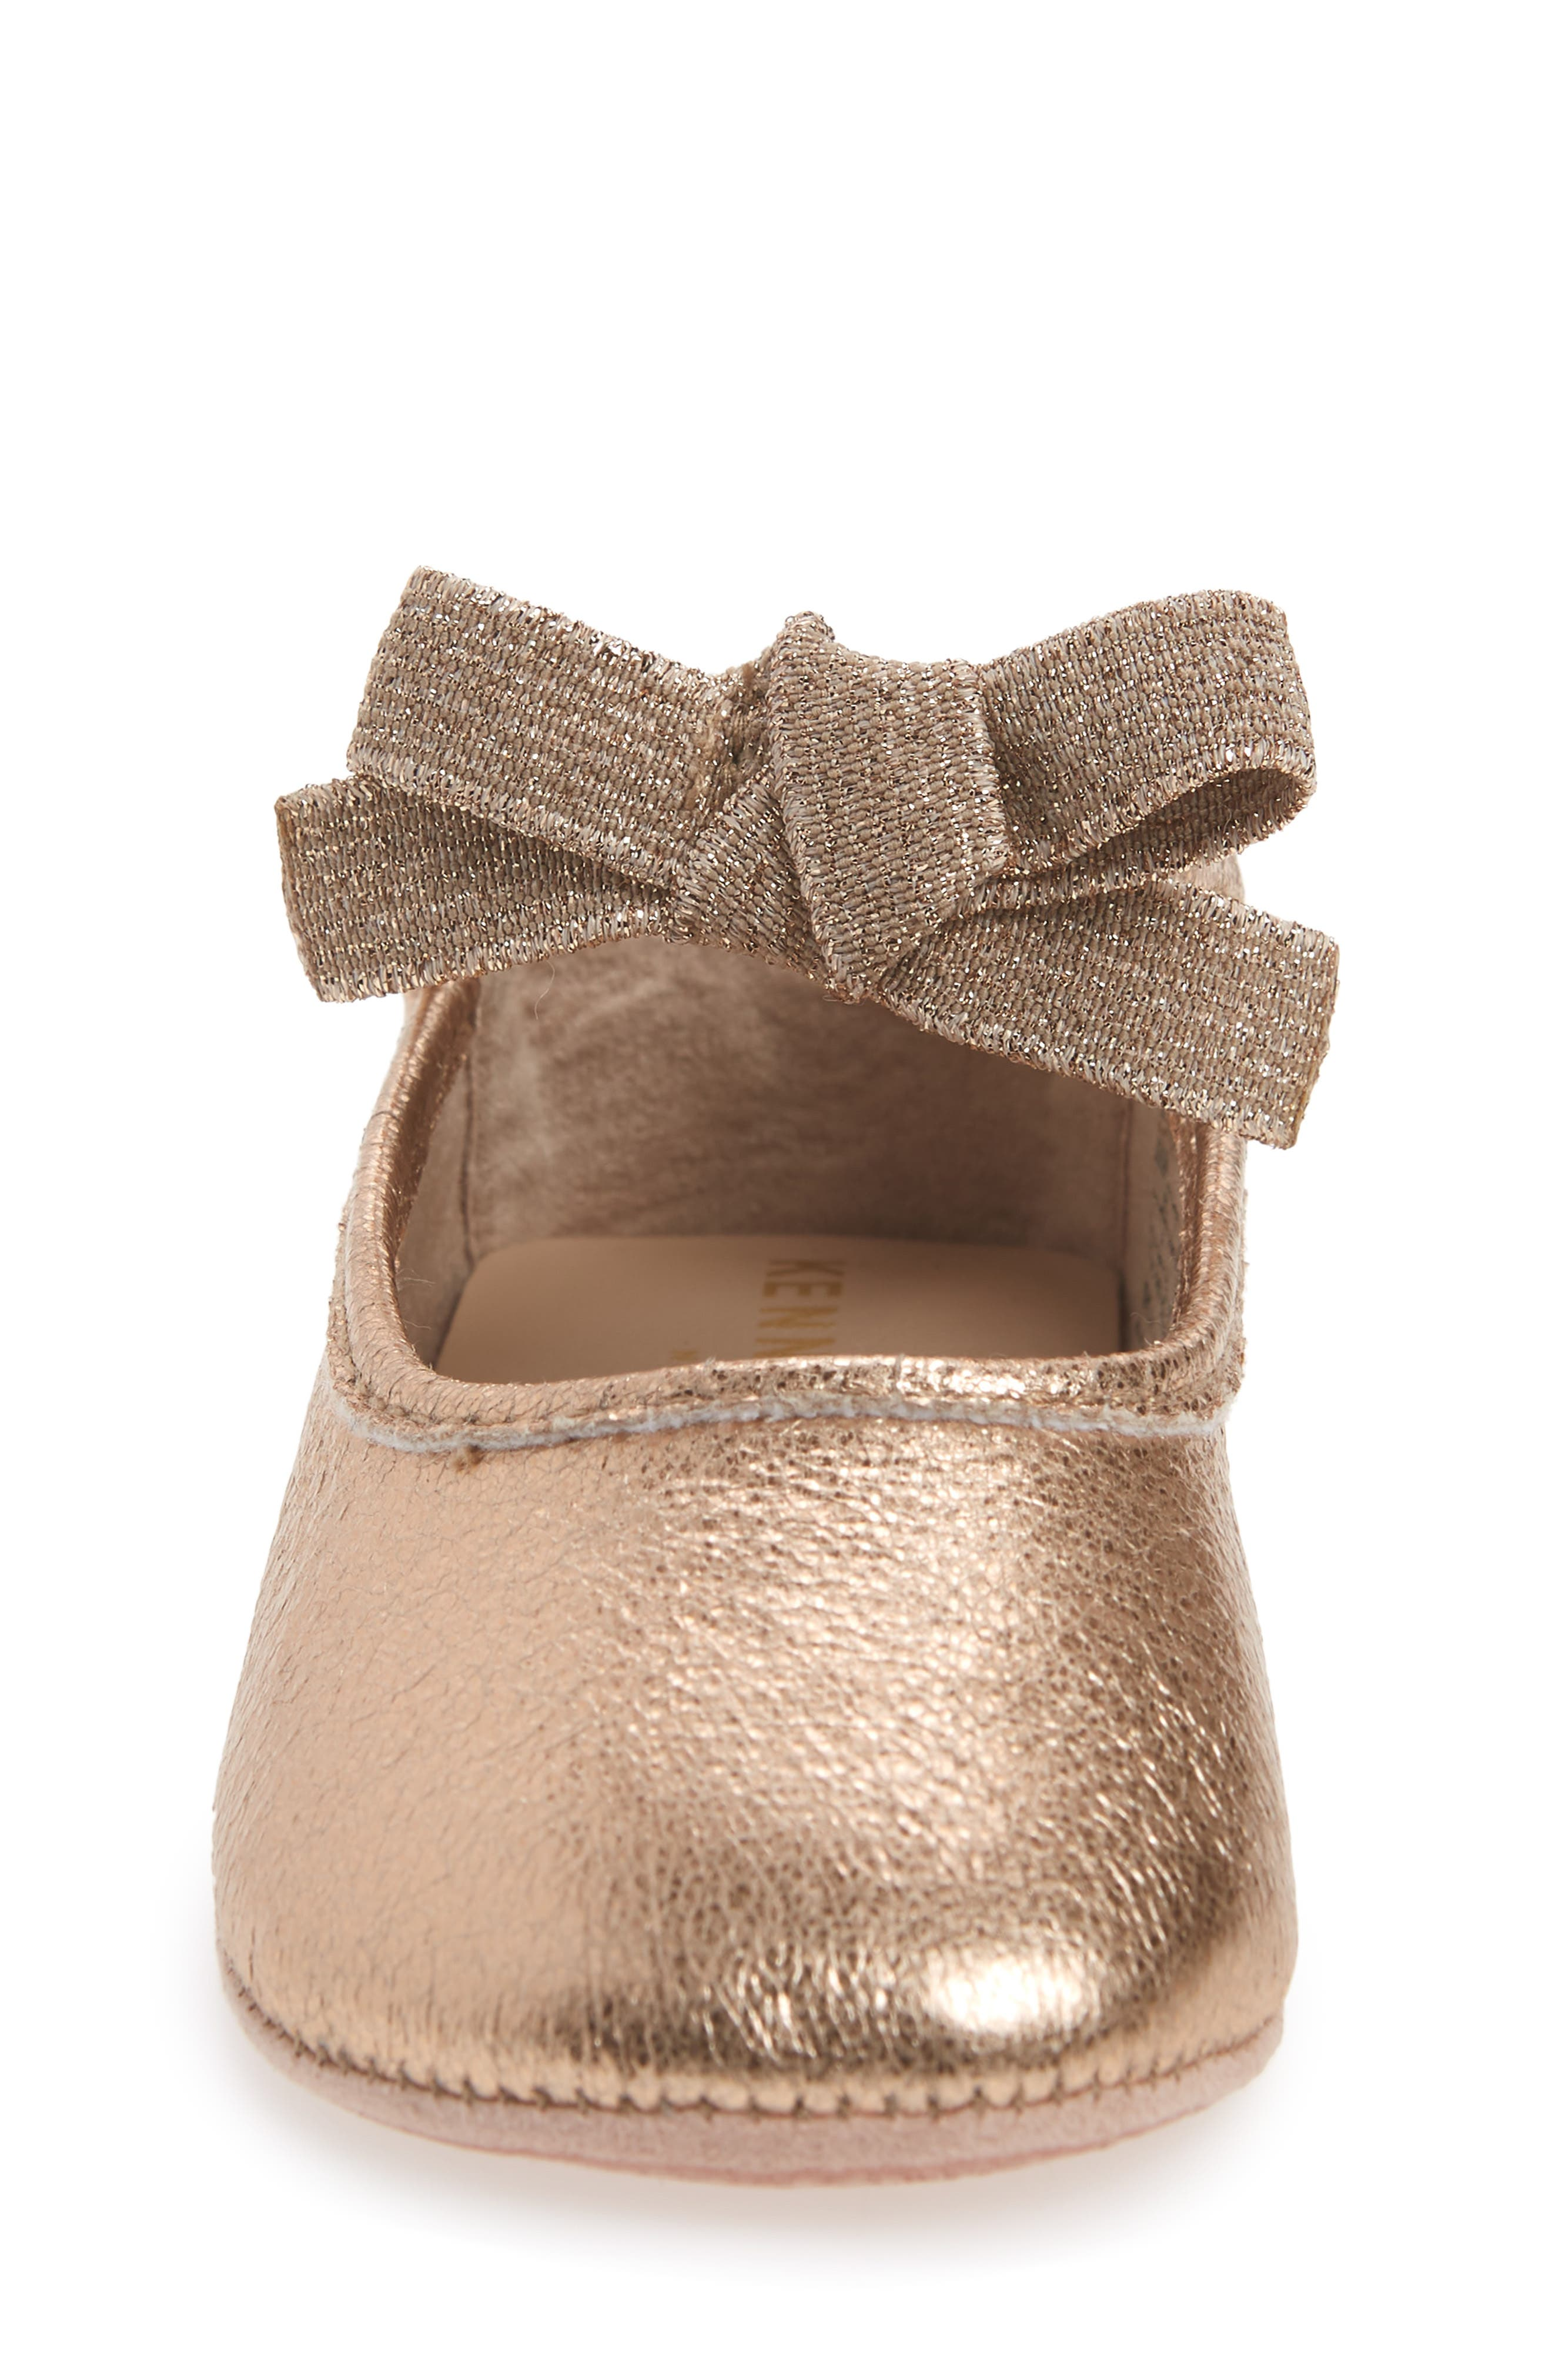 KENNETH COLE NEW YORK, Rose Bow Metallic Ballet Flat, Alternate thumbnail 4, color, ROSE